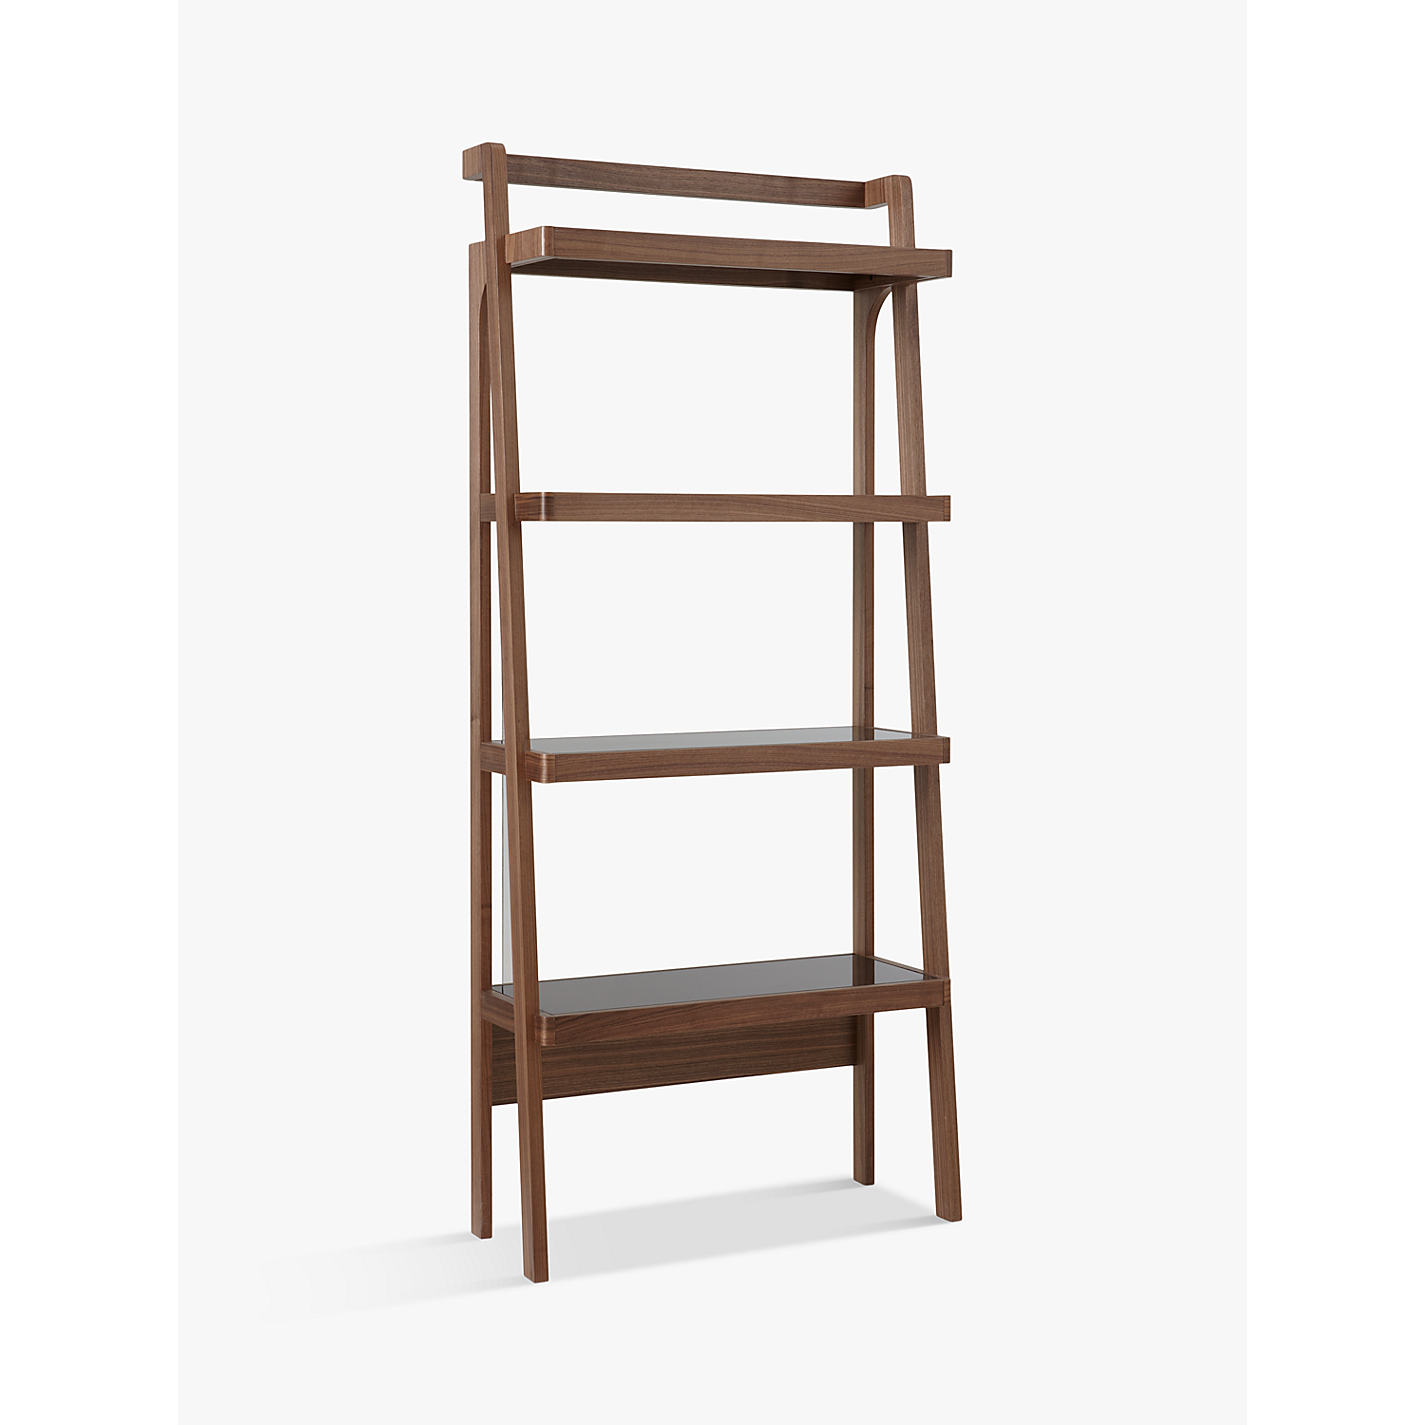 buy john lewis gazelle bookcase walnut  john lewis - buy john lewis gazelle bookcase walnut online at johnlewiscom